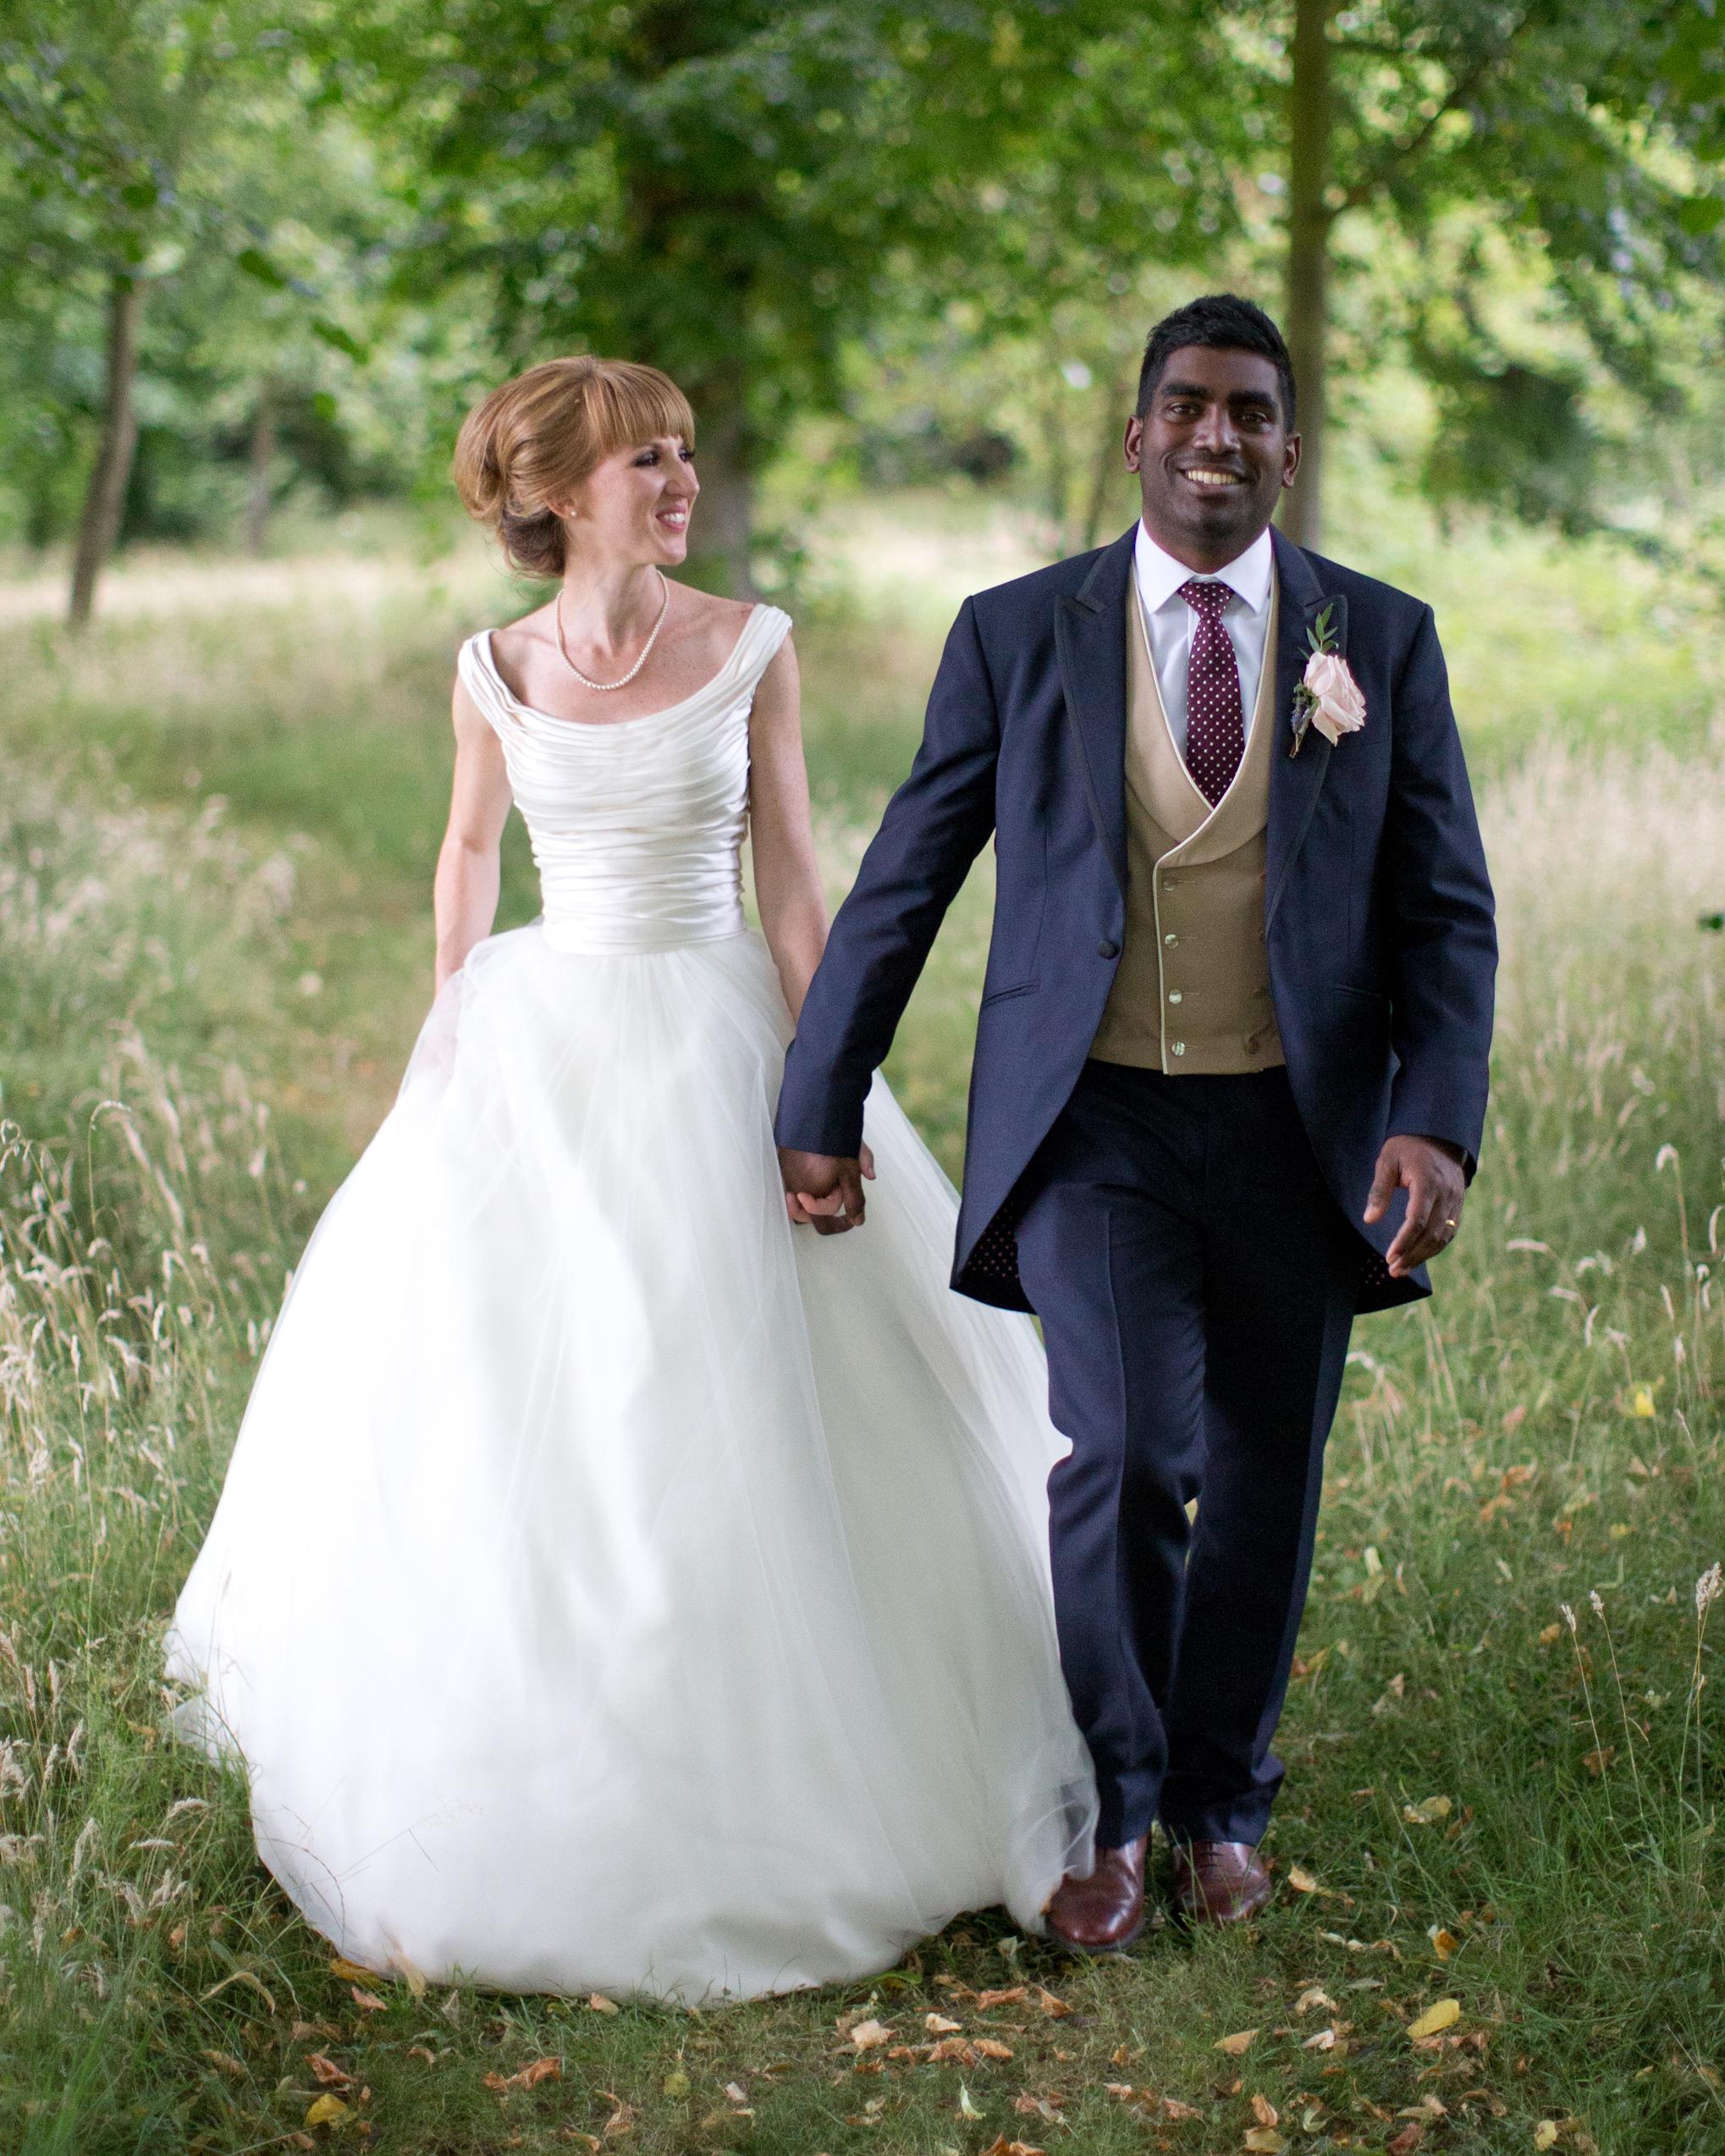 hayley-andrew-wedding-portrait9-0714.jpg